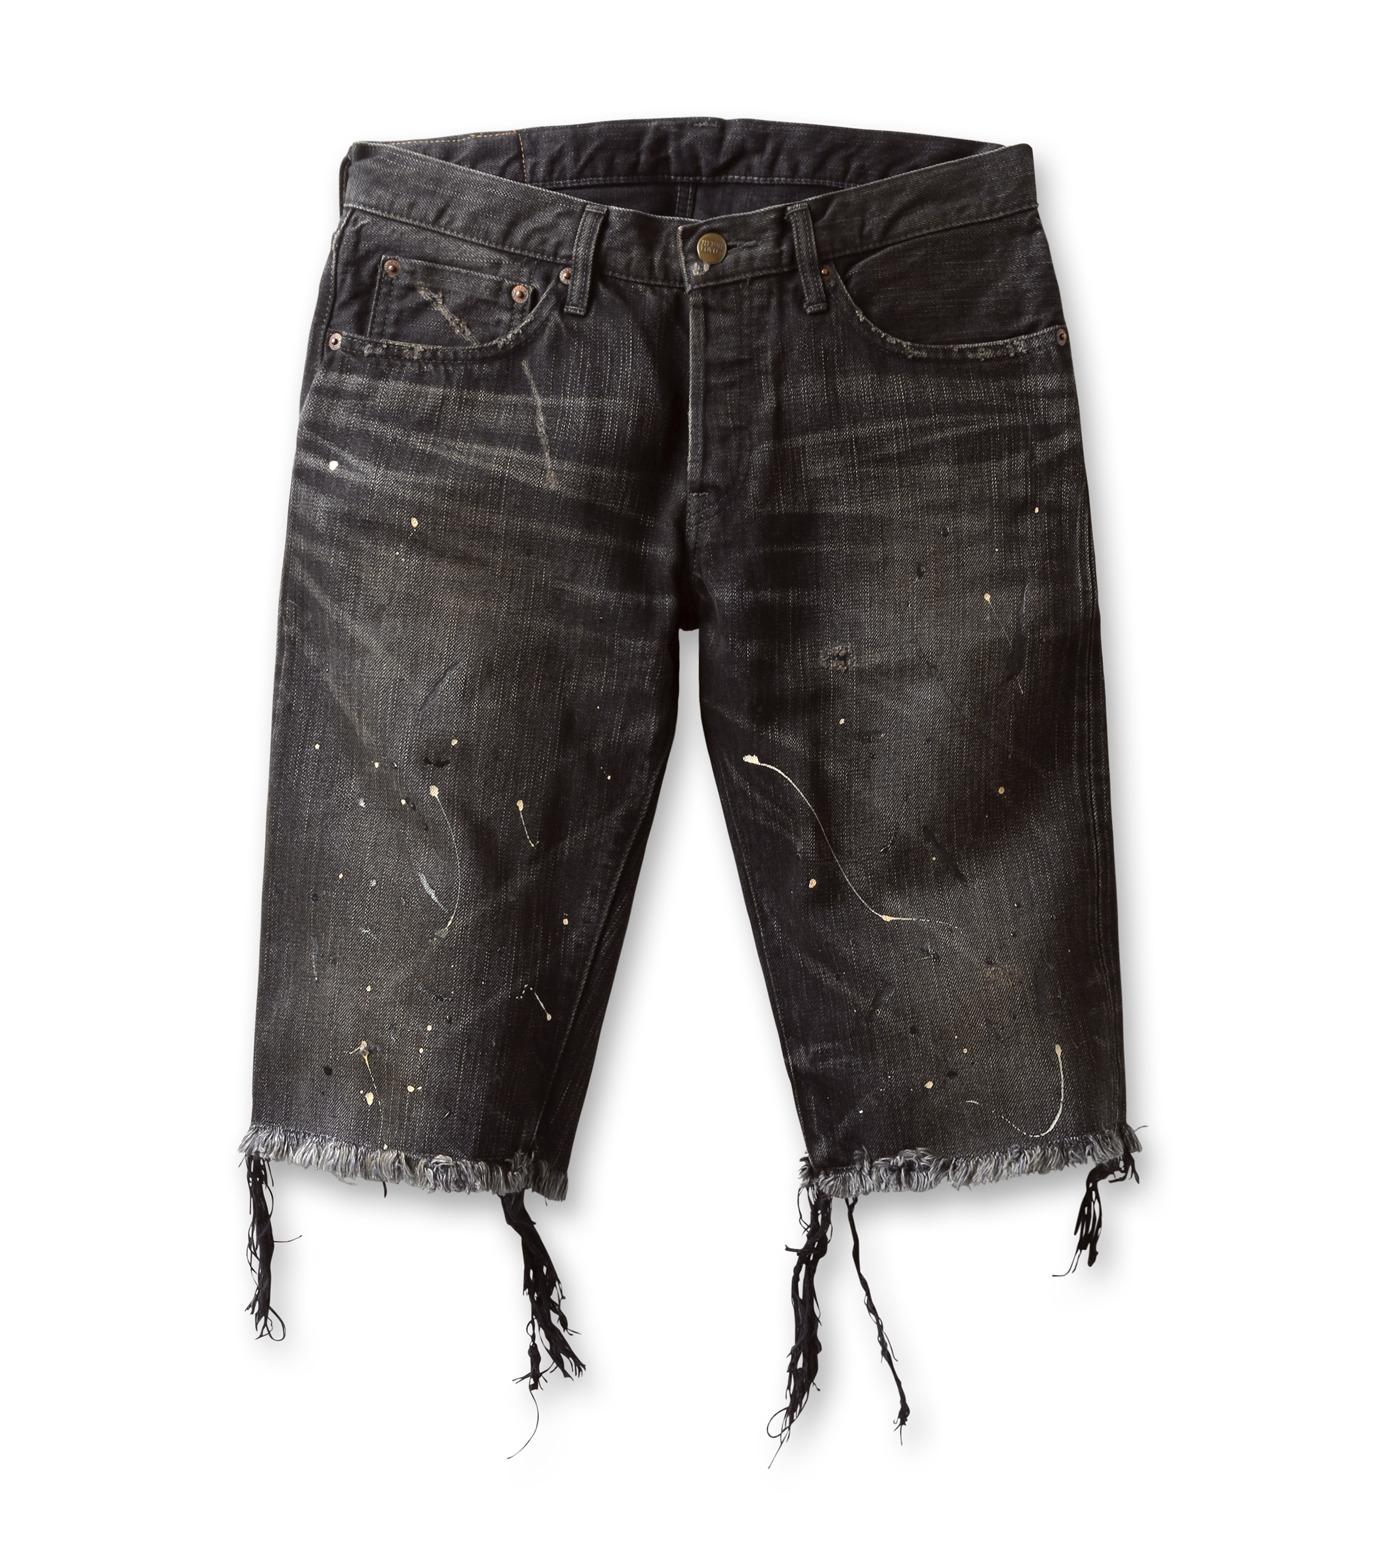 Heddie Lovu(エディー ルーヴ)のALD-BKV-HPT-BLACK(パンツ/pants)-ALD-BKV-HPT-13 拡大詳細画像1